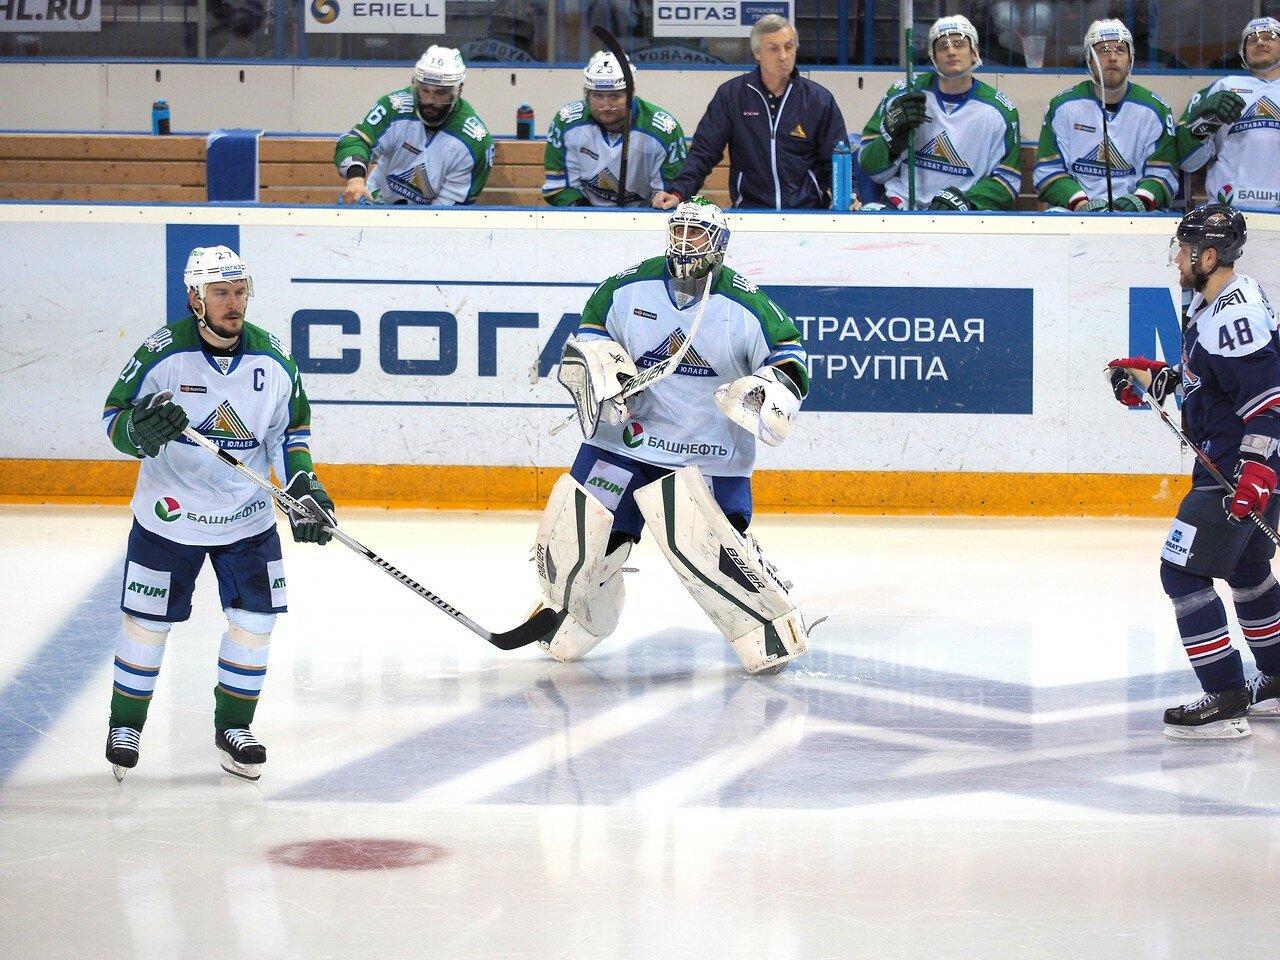 137Плей-офф 2016 Восток Финал Металлург - Салават Юлаев 23.03.2016